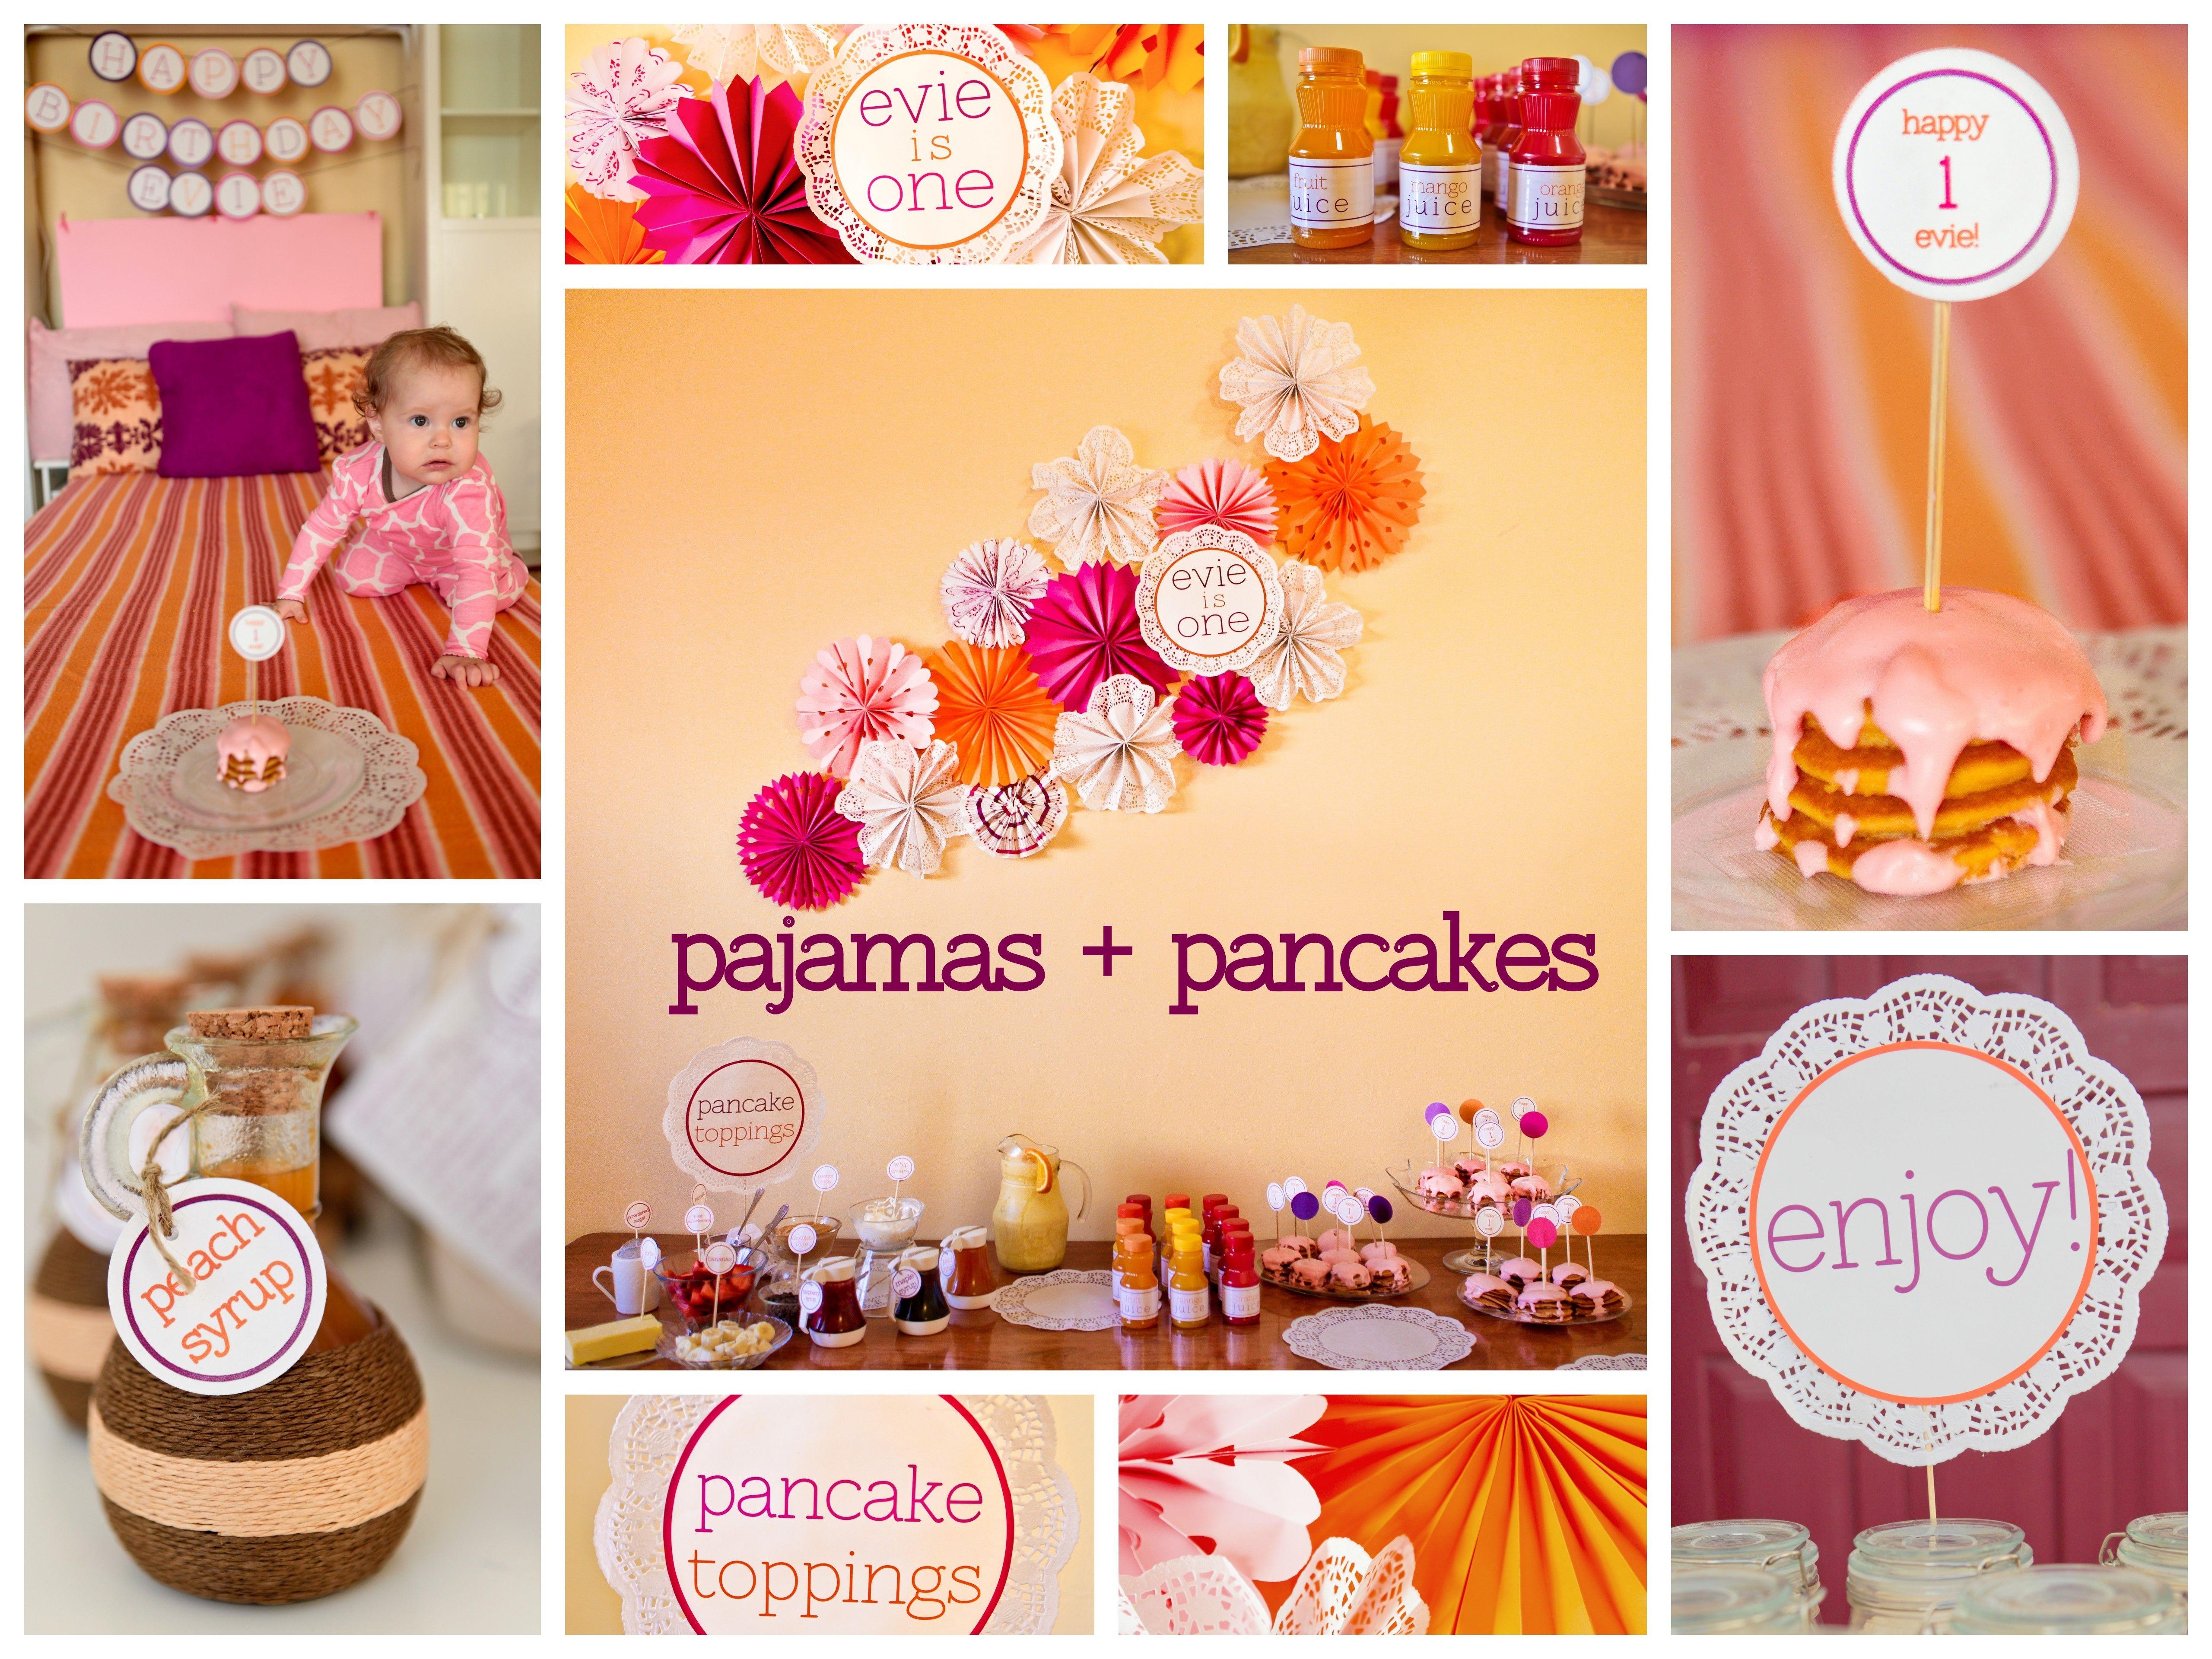 1st birthday photo shoot ideas - Google Search   Photoshoot Ideas ...